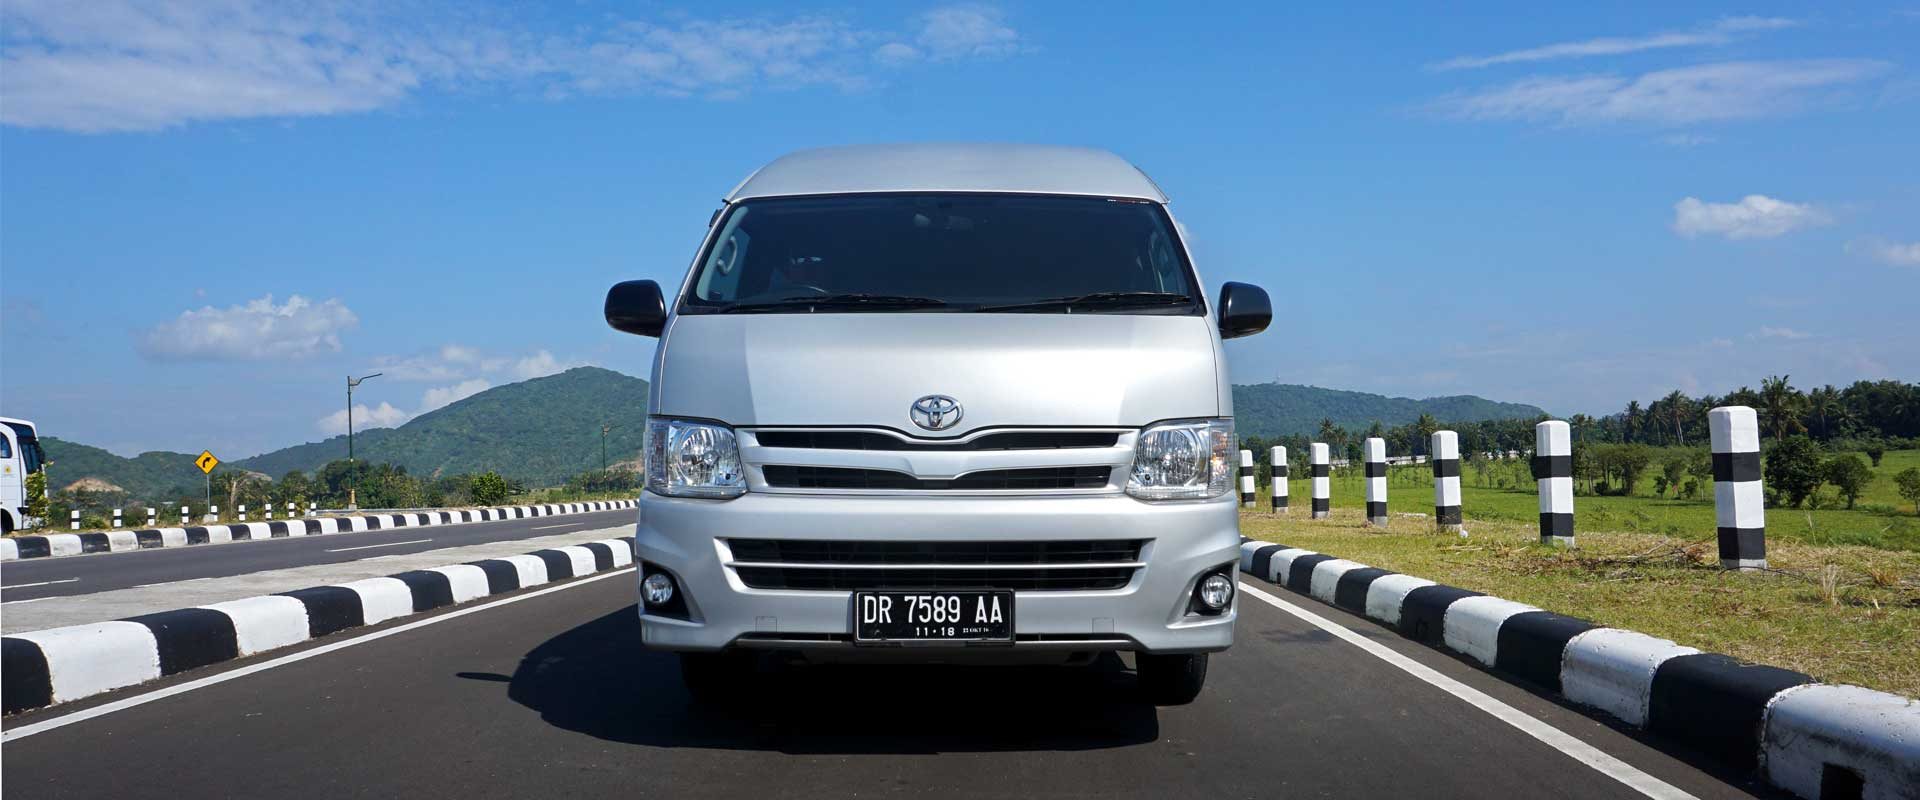 Paket Sewa Mobil Lombok Murah